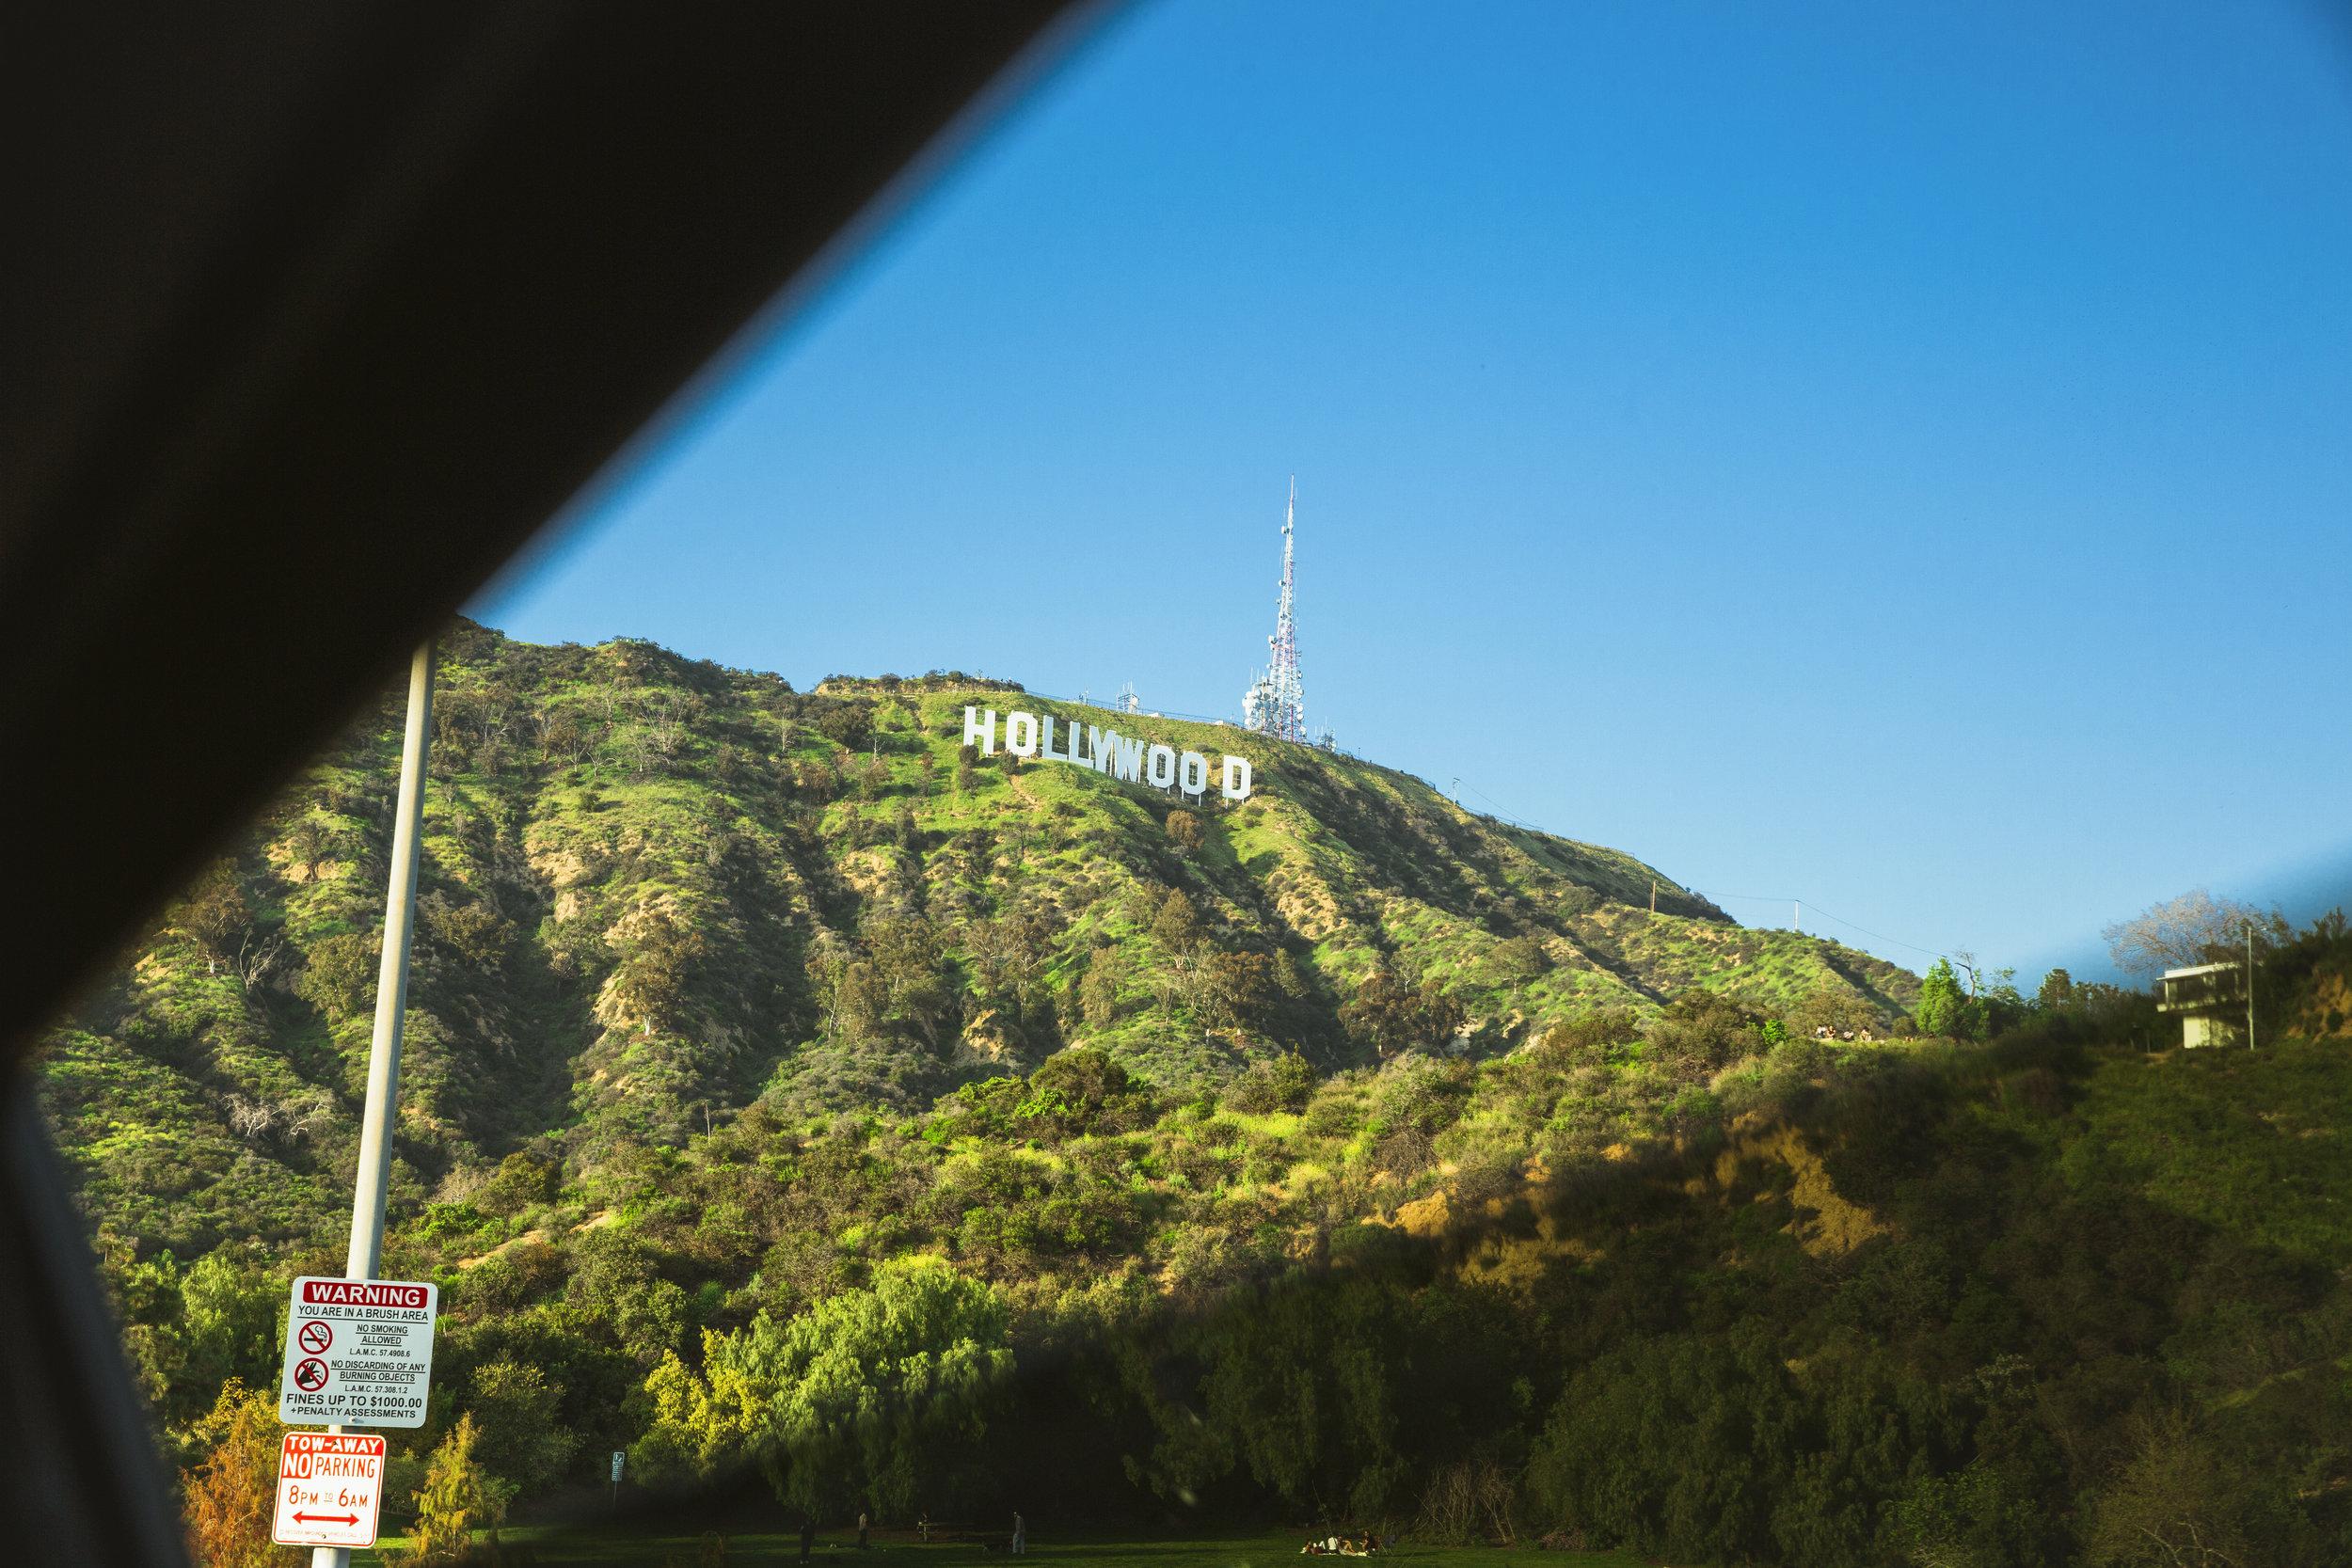 Hollywood sign_02_COLOR.jpg